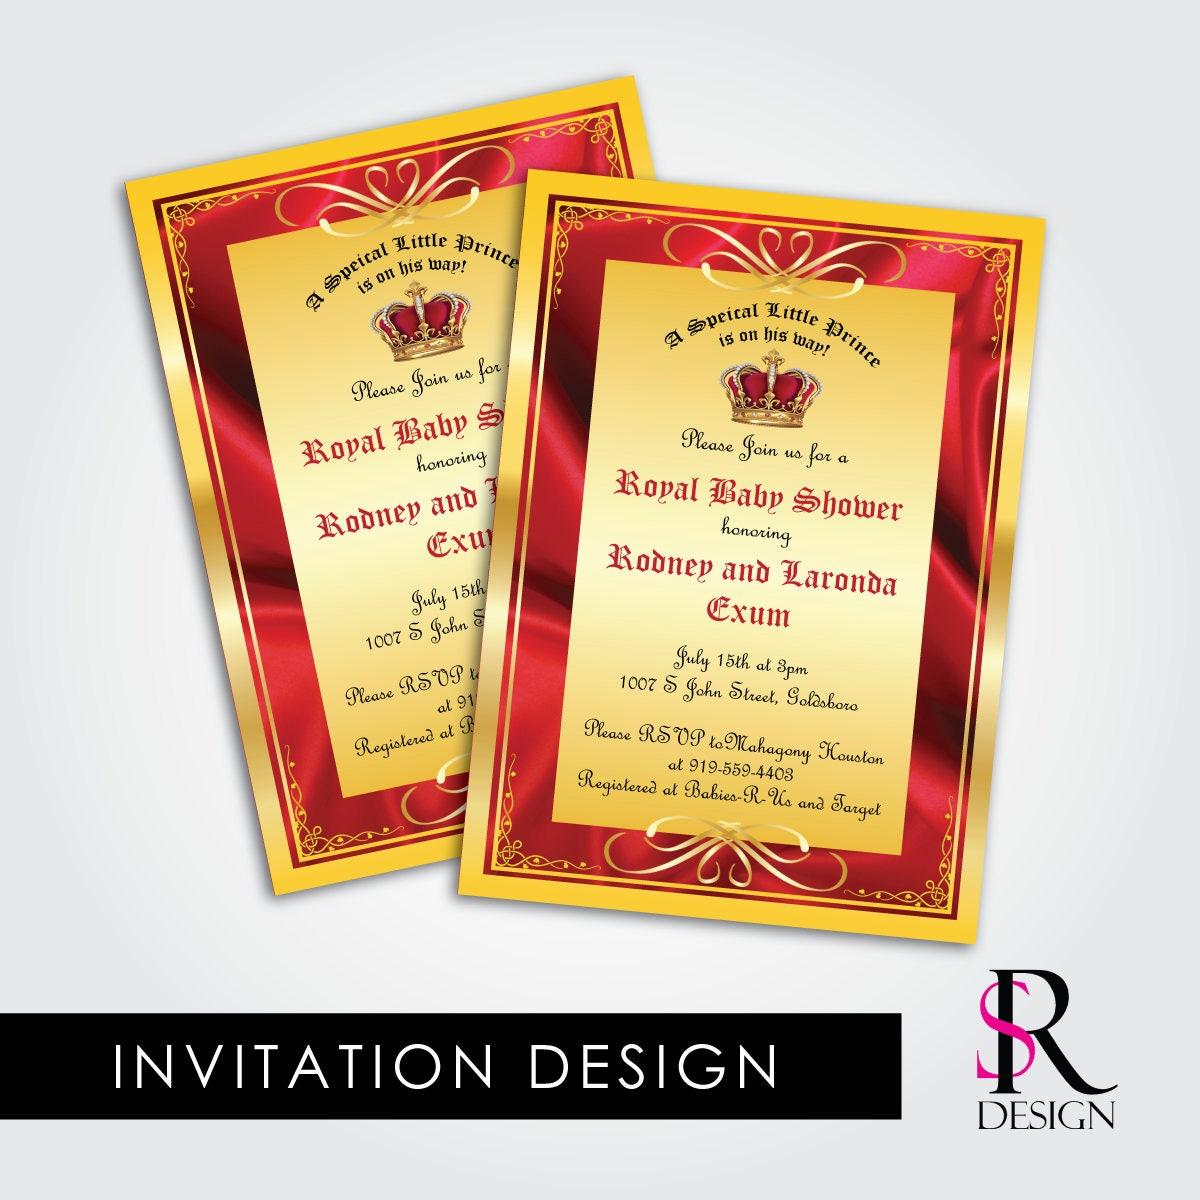 Royal Baby Shower Invitation Prince Birthday Invitation – Prince Birthday Invitation